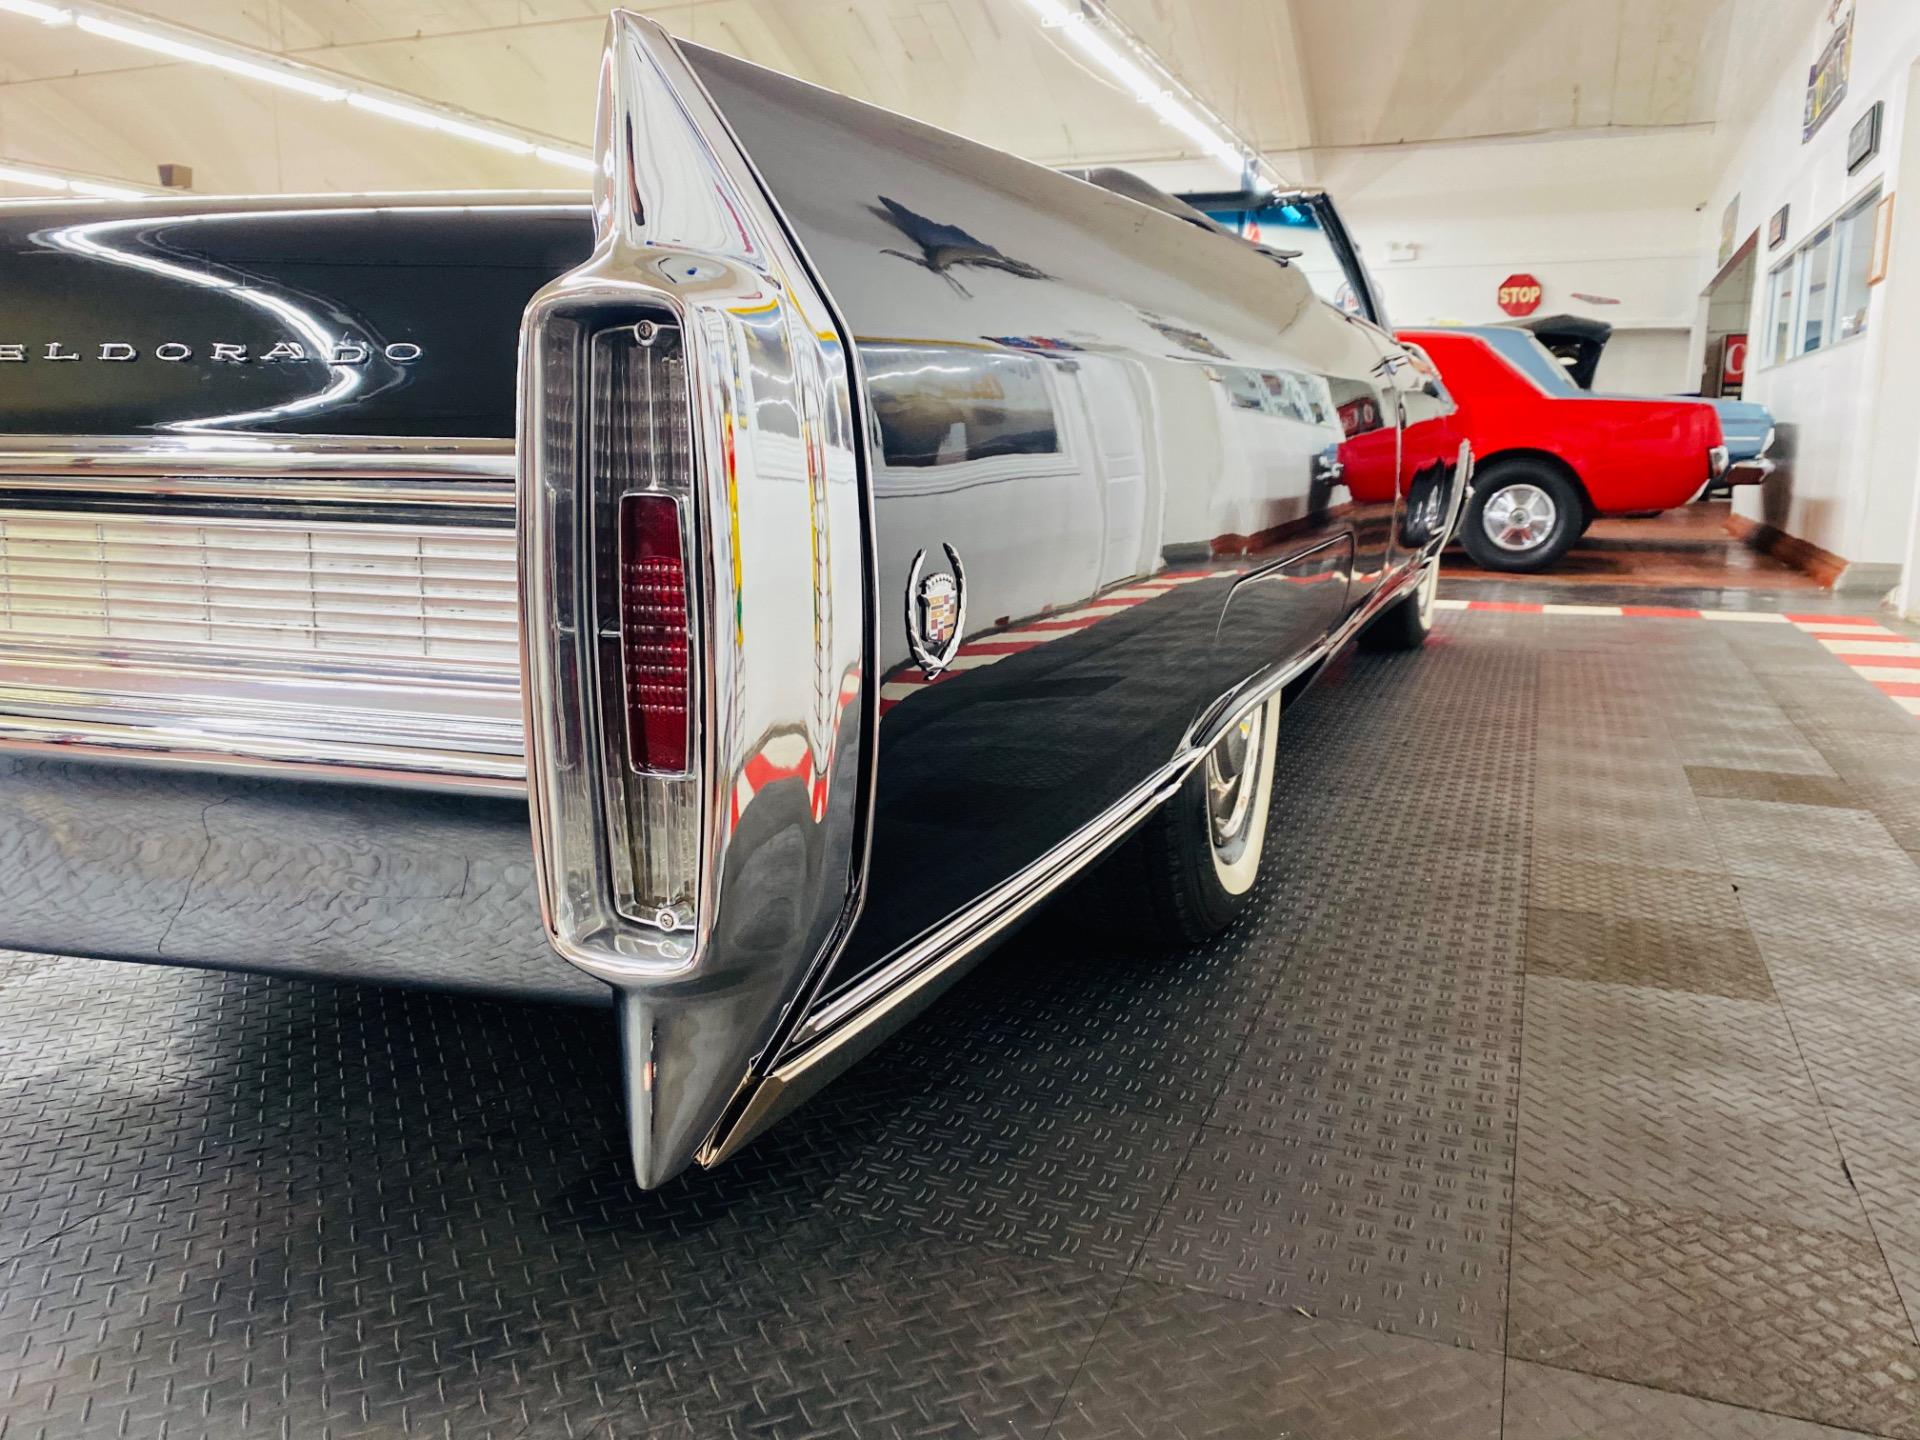 Used 1965 Cadillac Eldorado - TRIPLE BLACK CONVERTIBLE - SHOW QUALITY RESTORATION - SEE VIDEO | Mundelein, IL